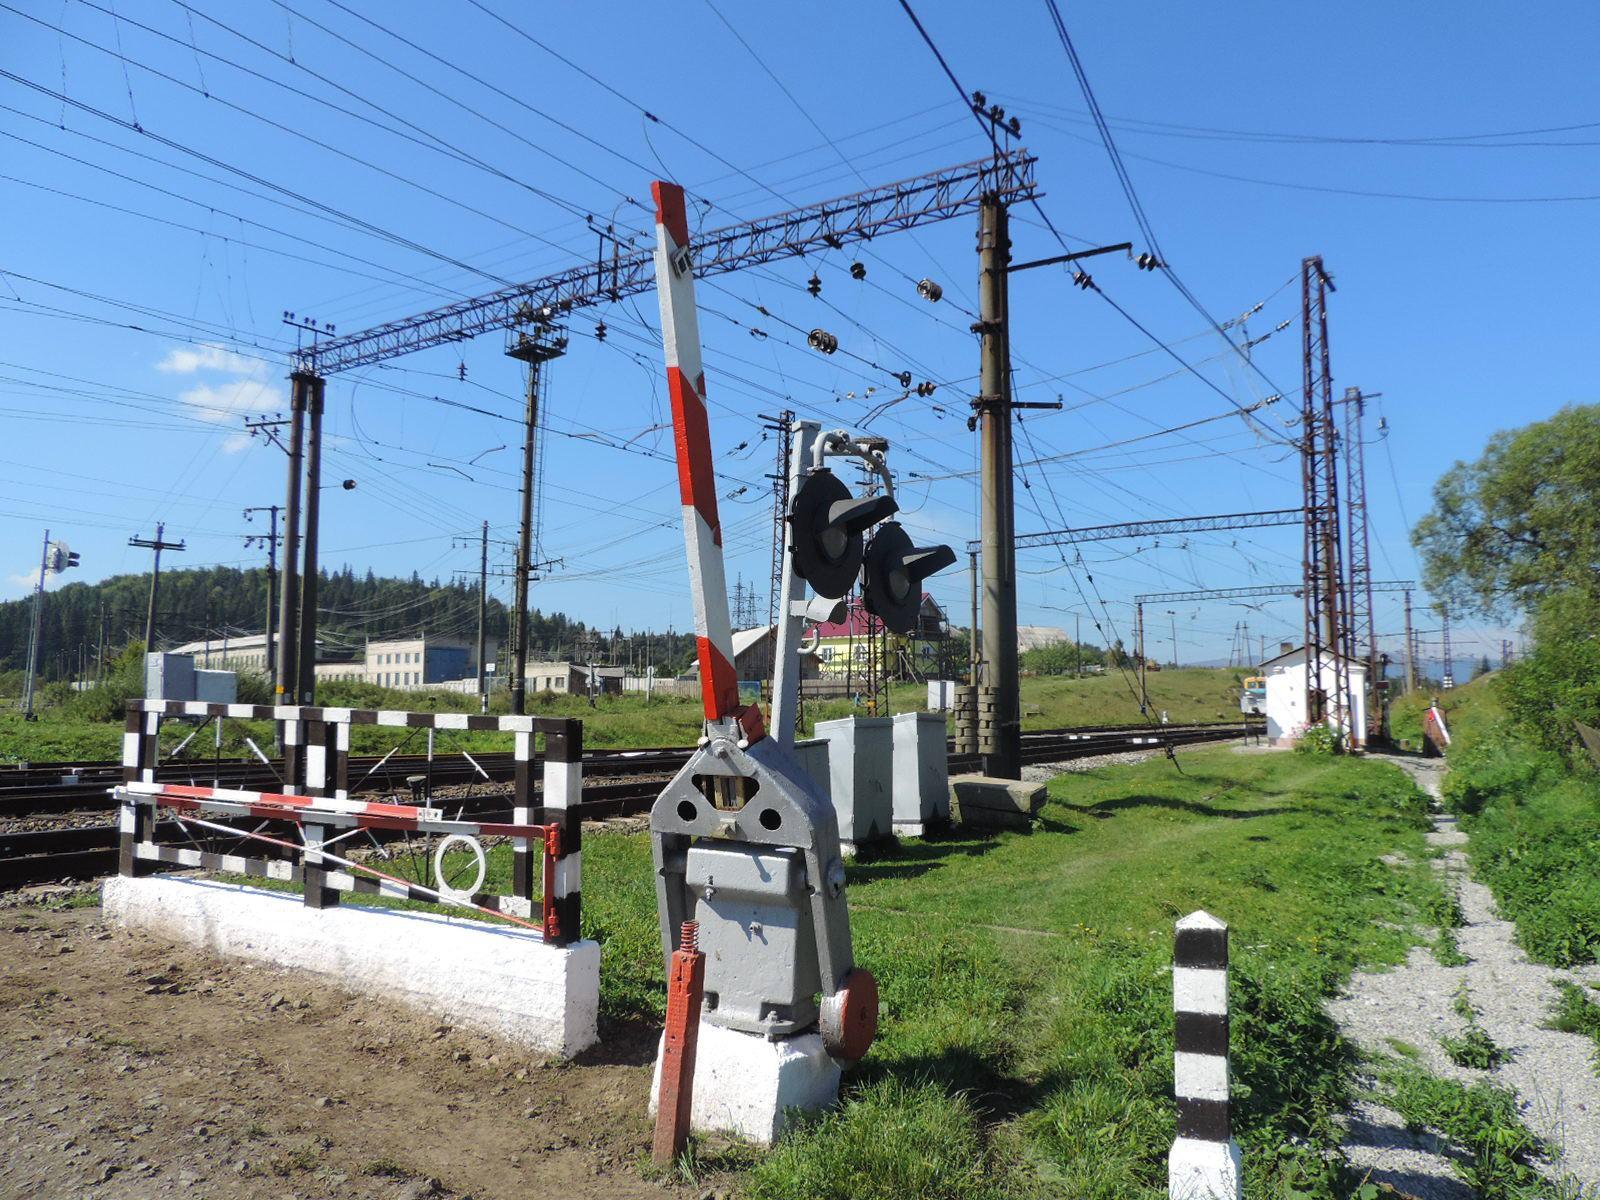 Railway Traction Substations 110 10 Kv Syanky Syanki Fenced Area Wiringdiagramoftractionsubstationfordummiesjpg